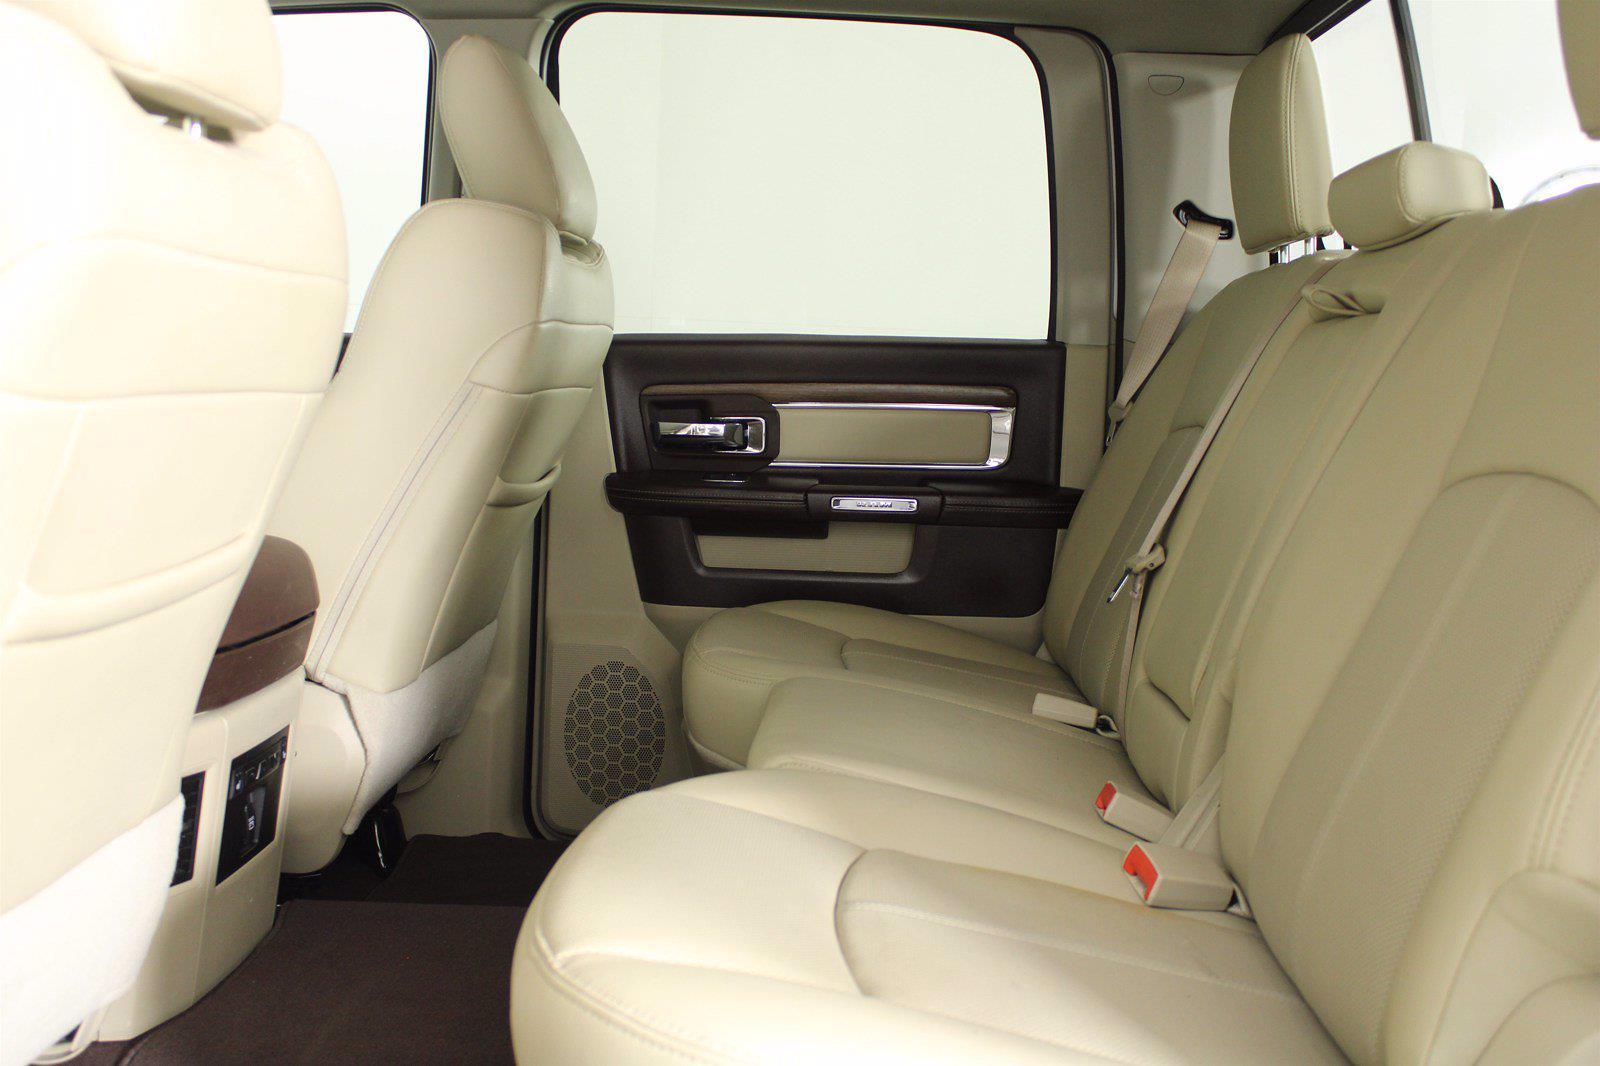 2018 Ram 3500 Crew Cab 4x4, Pickup #D110892A - photo 3